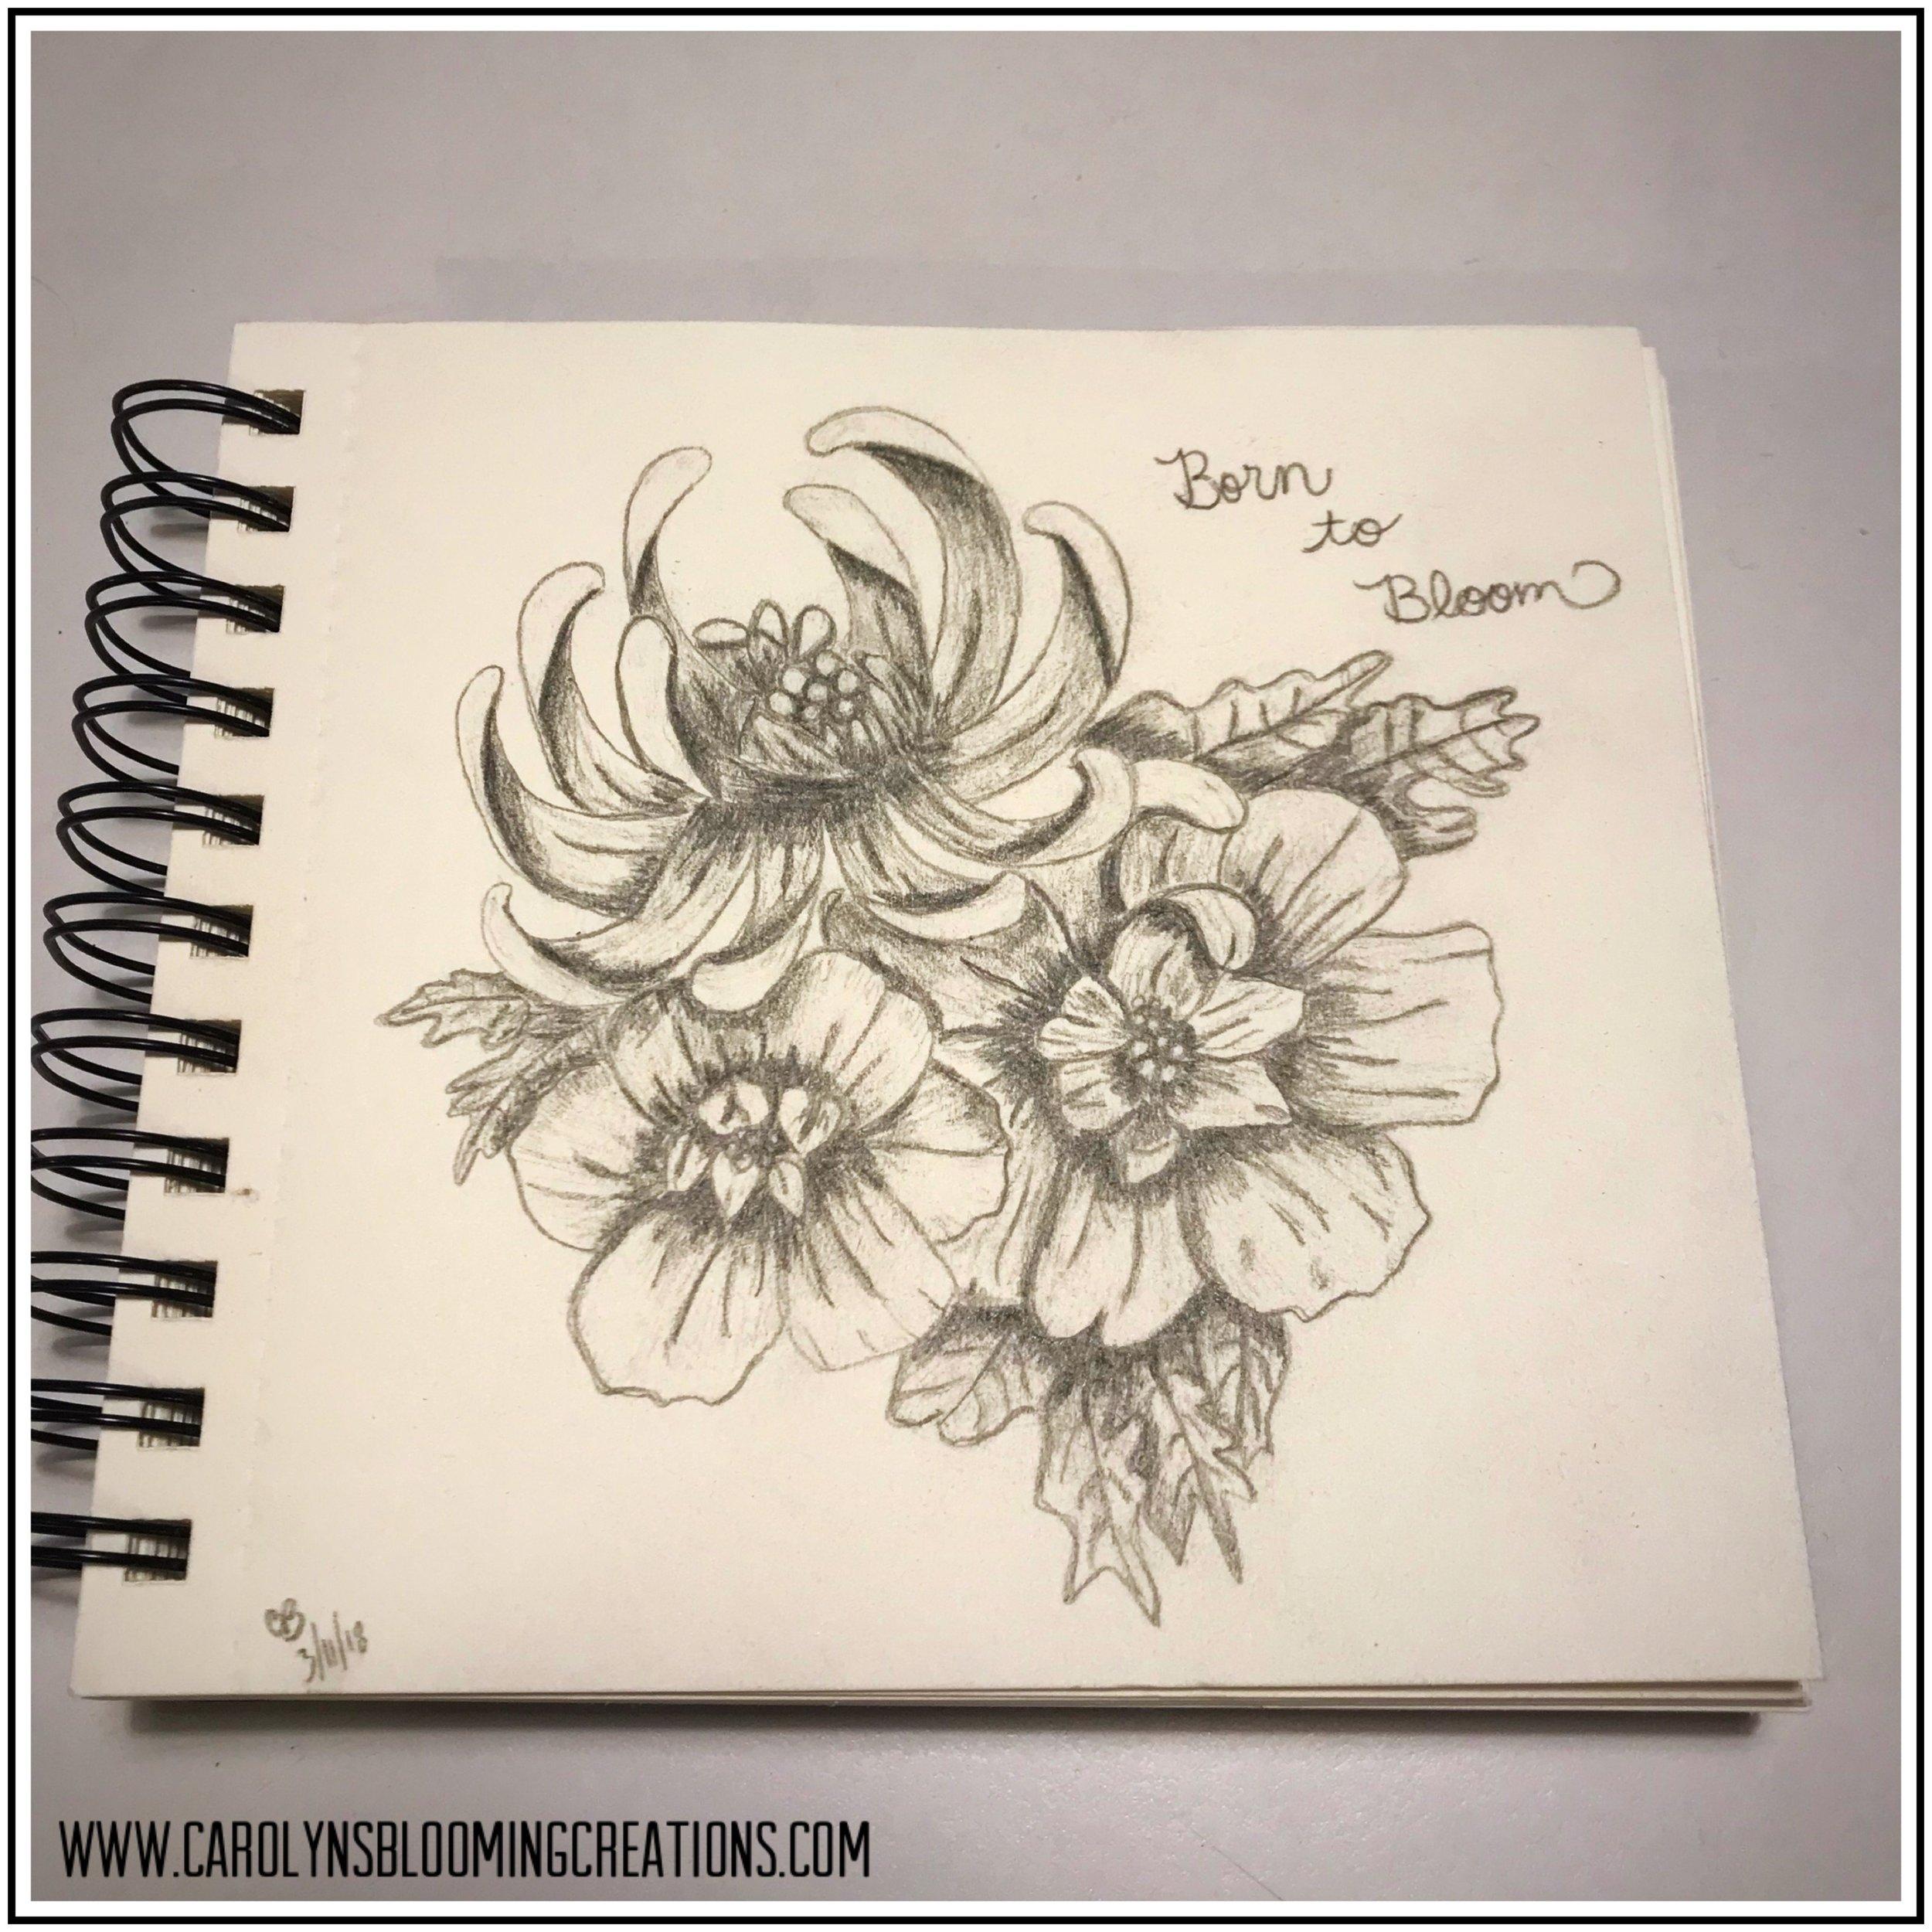 Sketch by Carolyn J. Braden: Born to Bloom